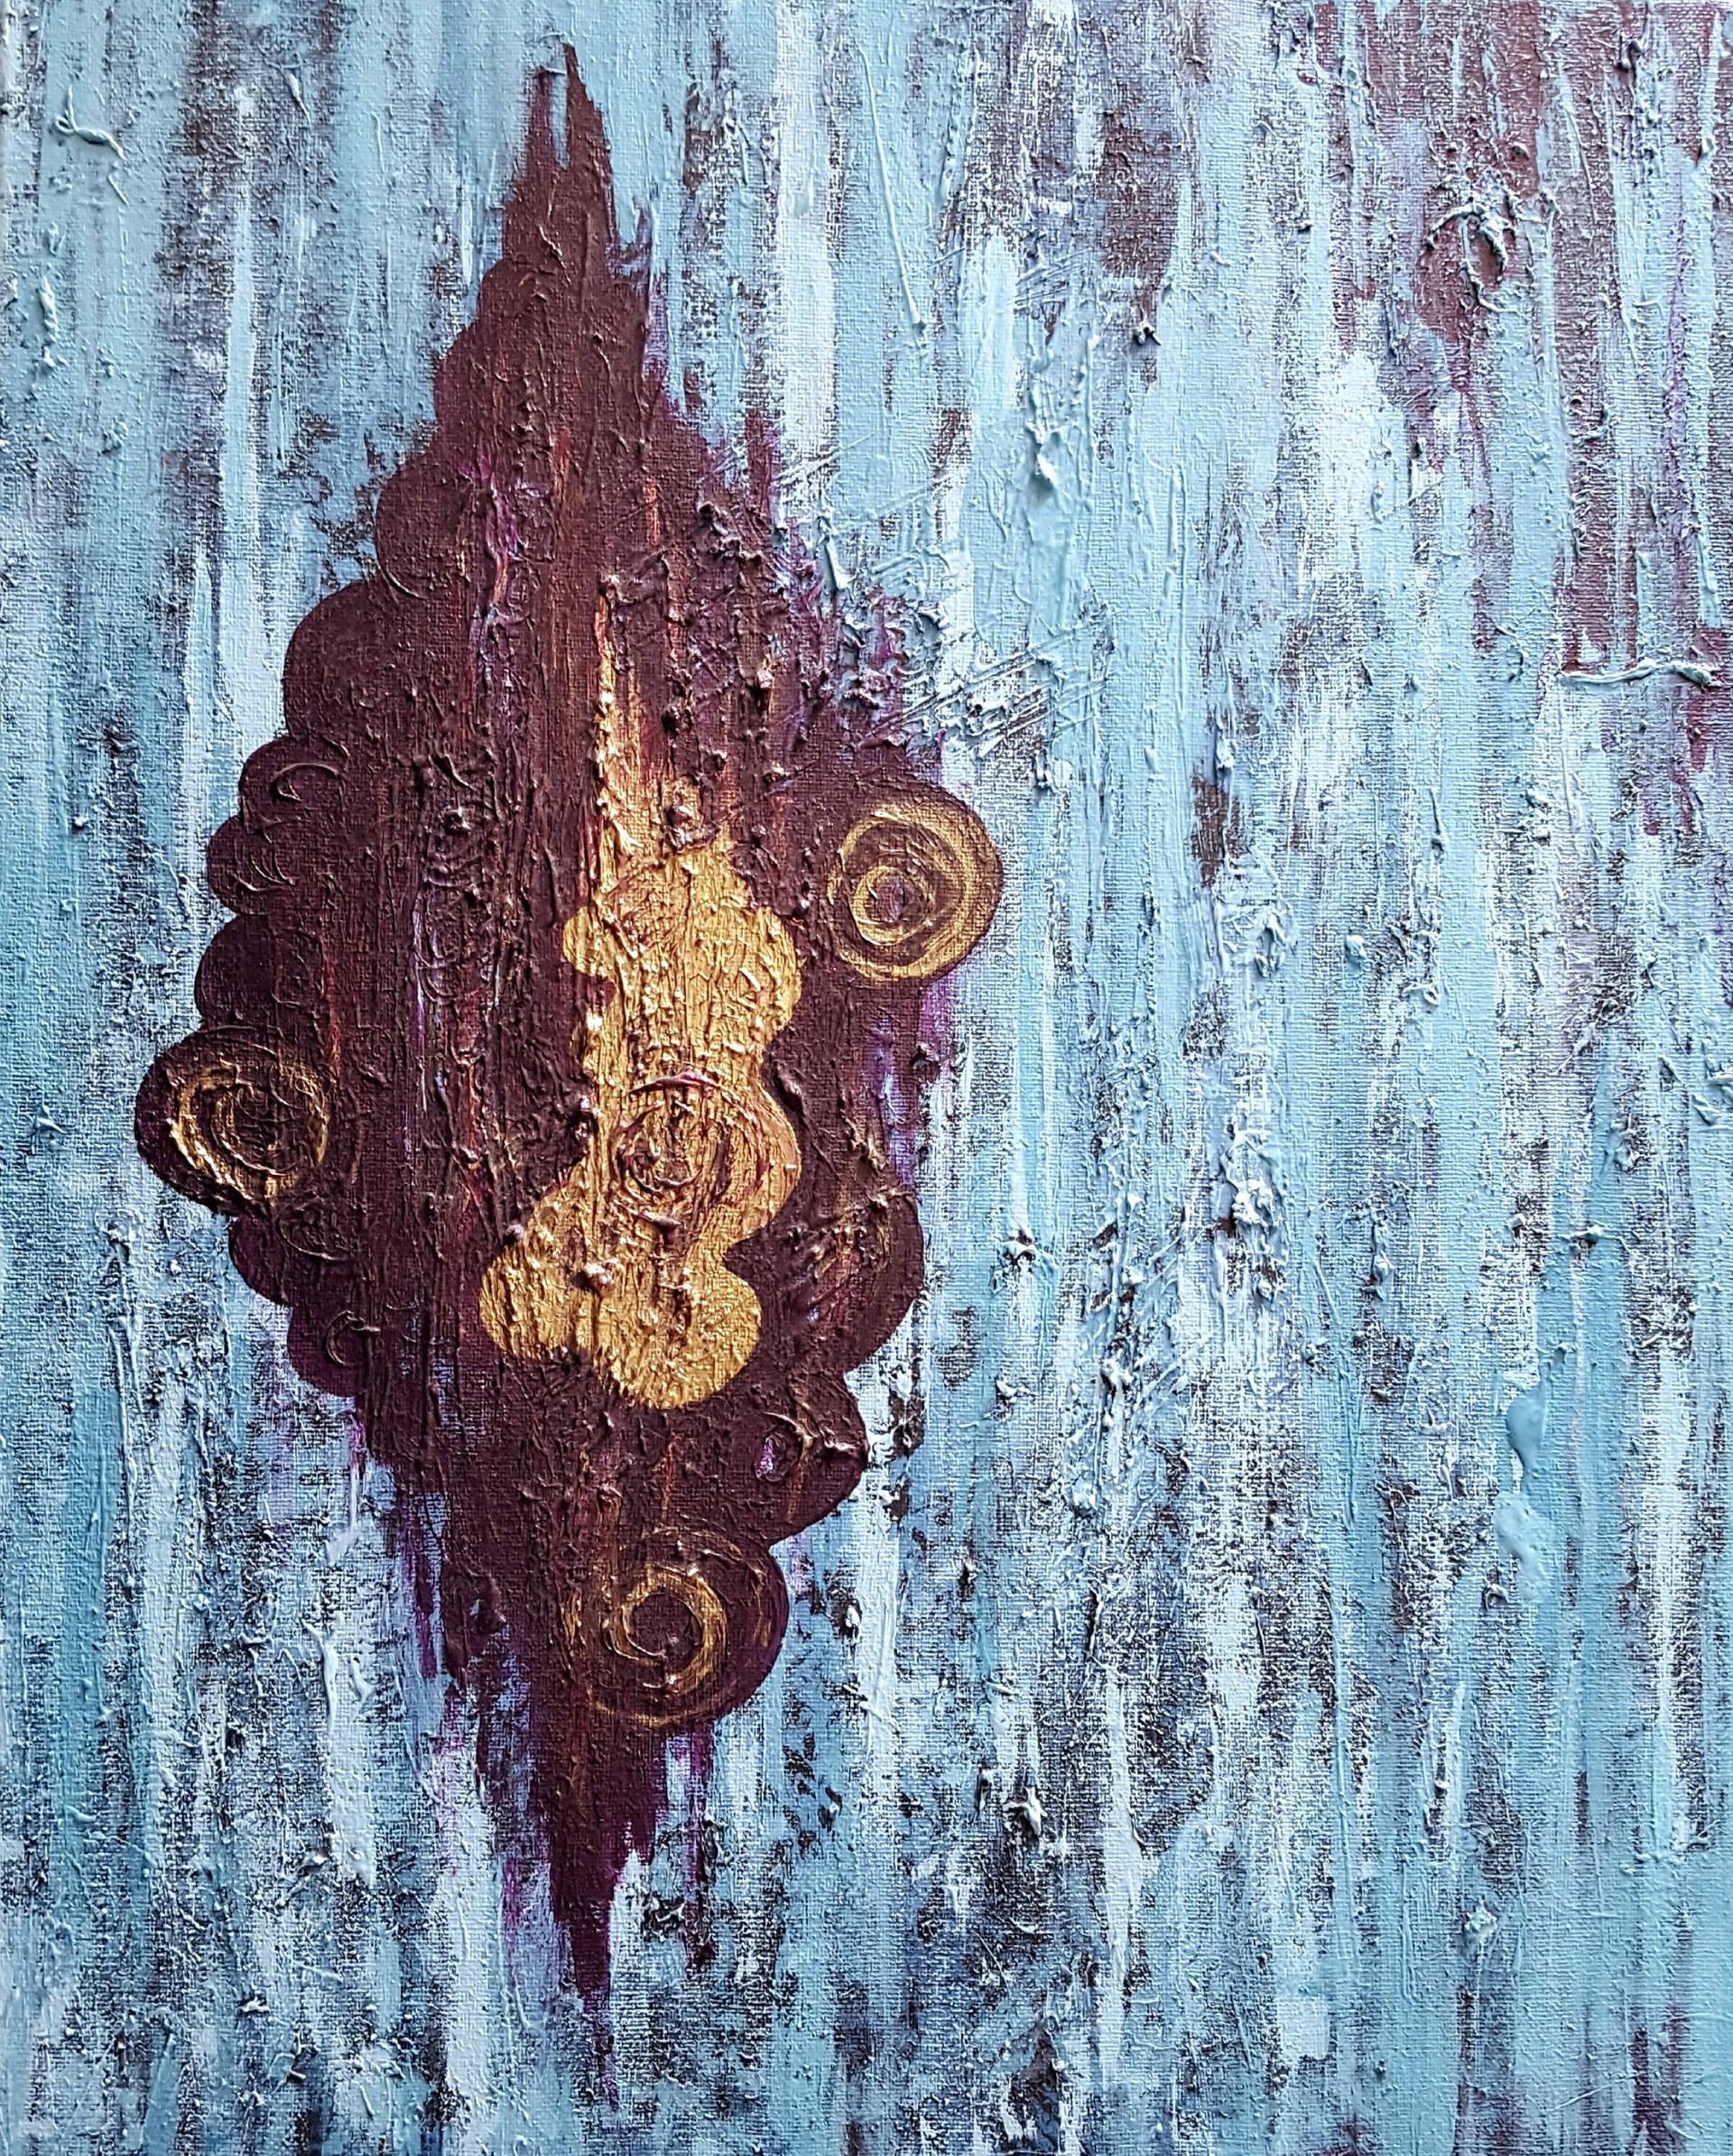 1-A (2006)